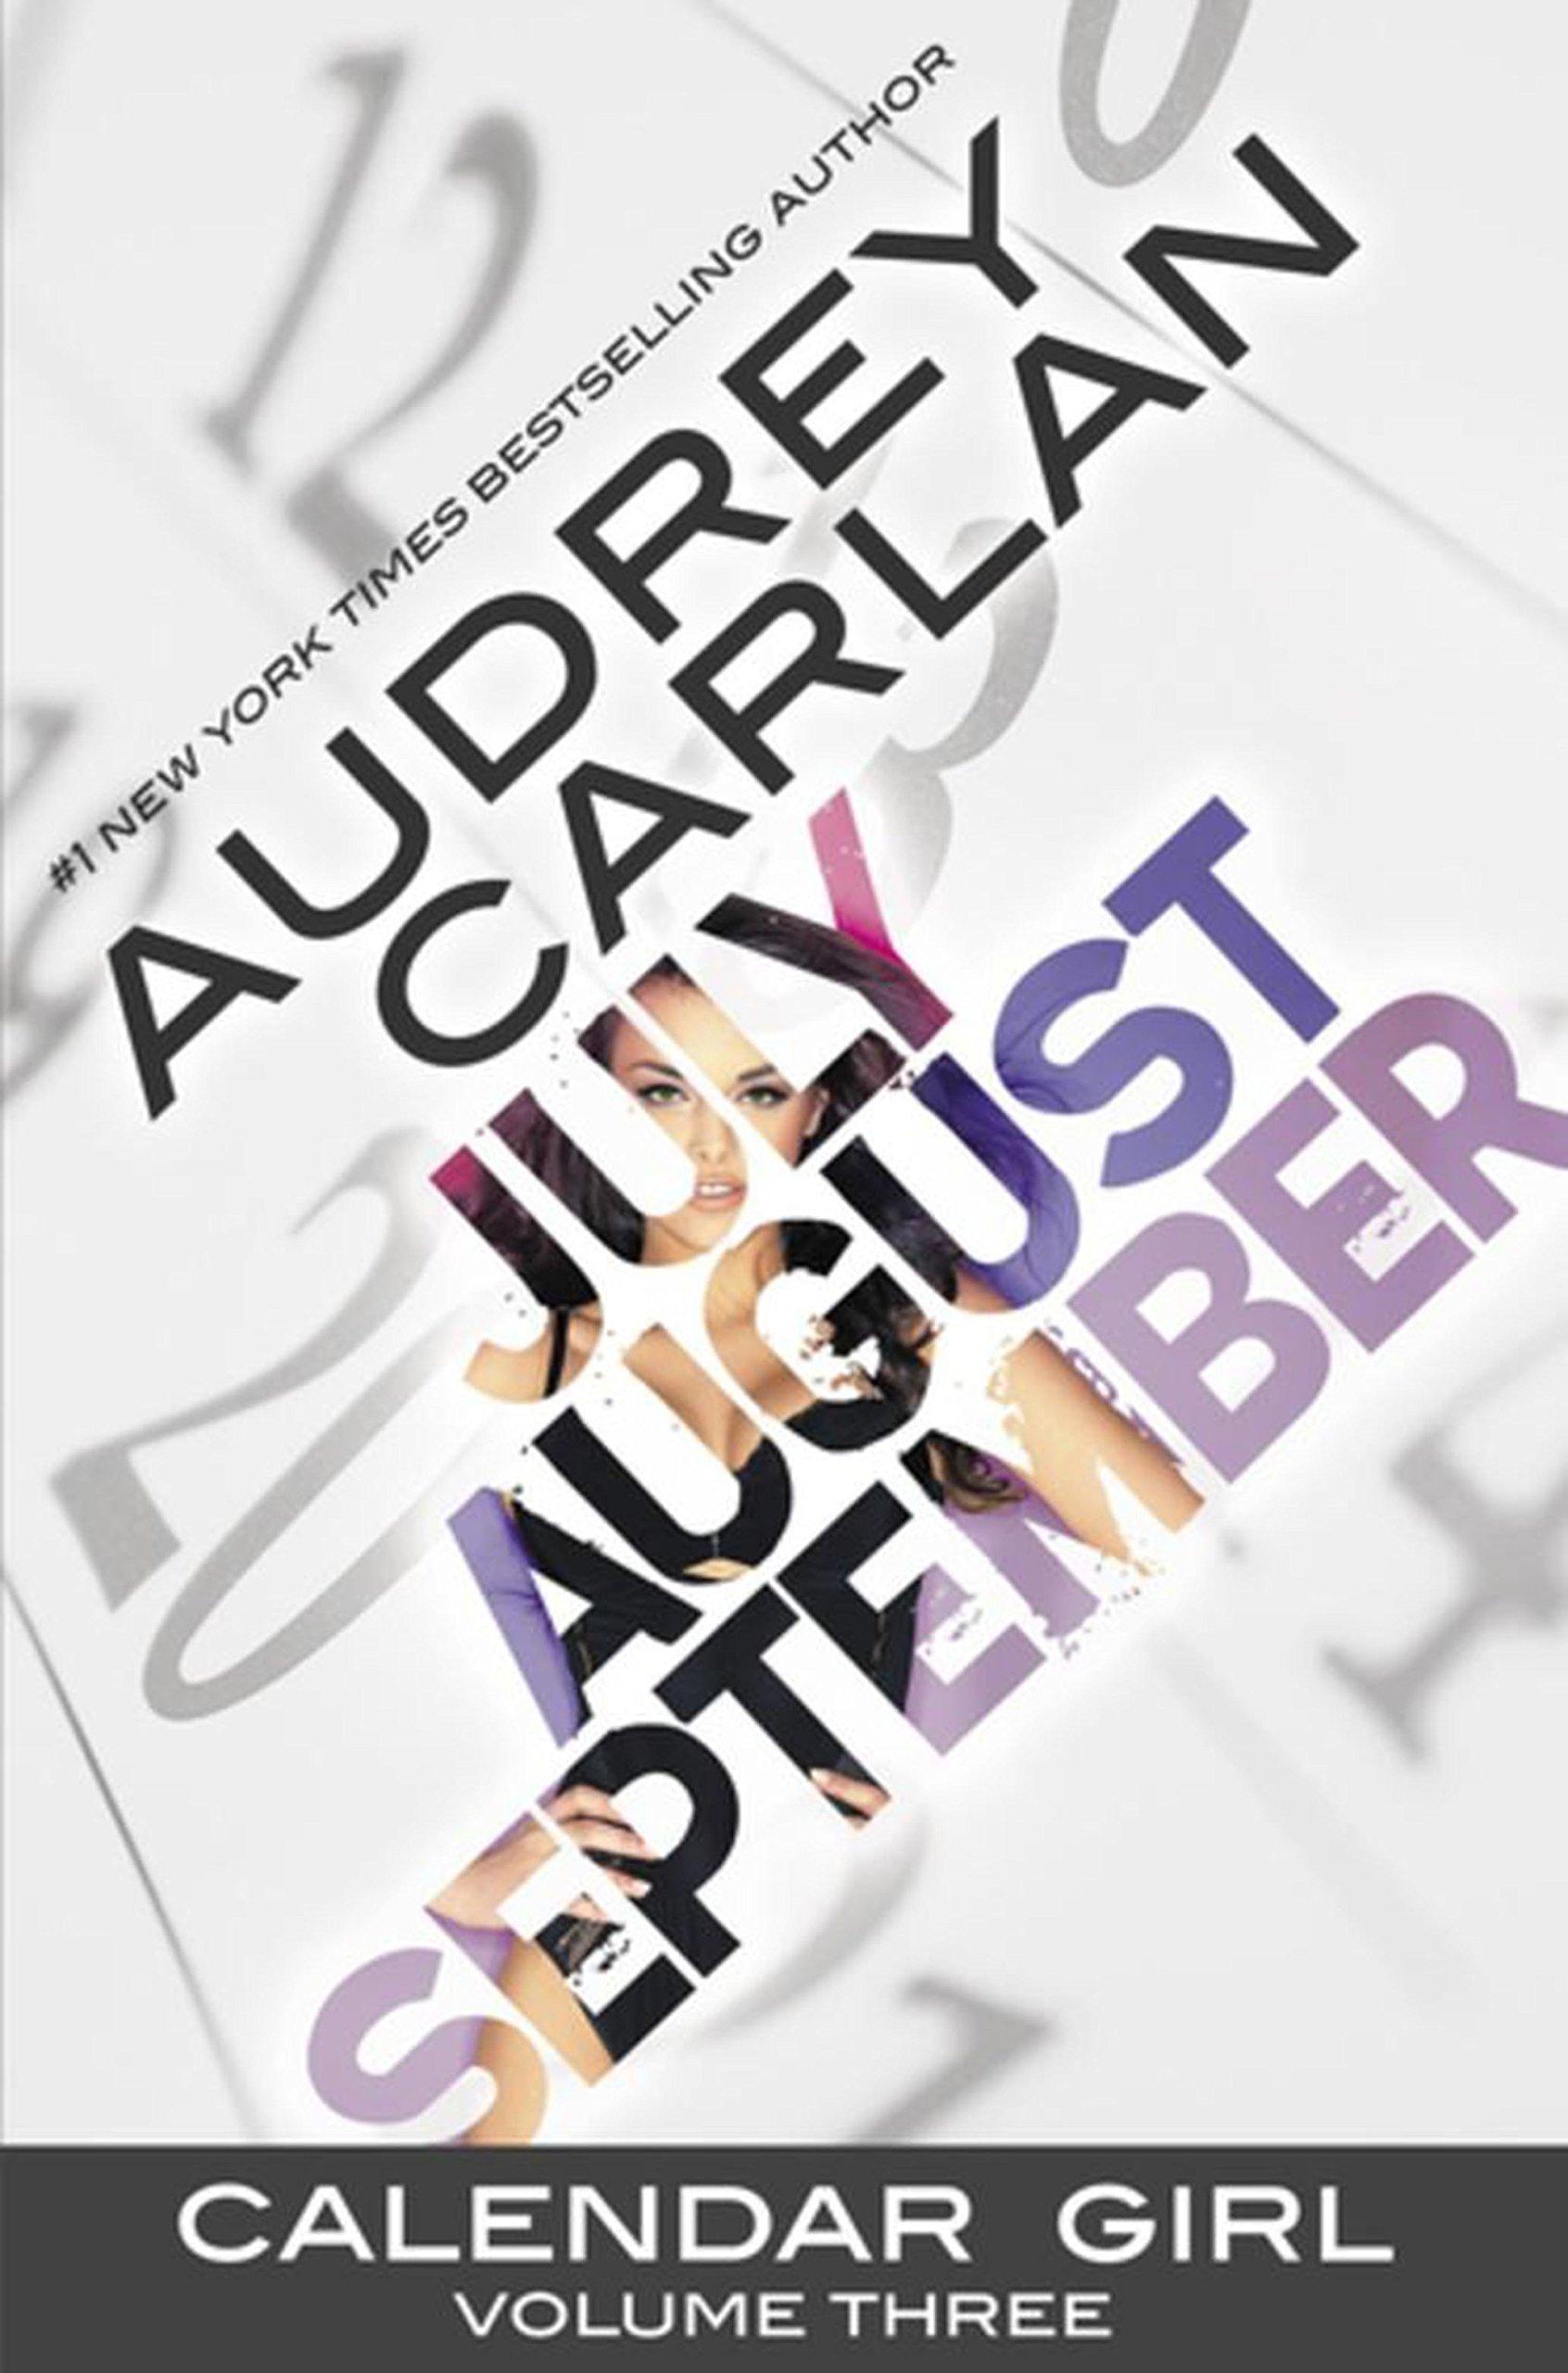 Calendar Girl Volume Three Audrey Carlan Amazon